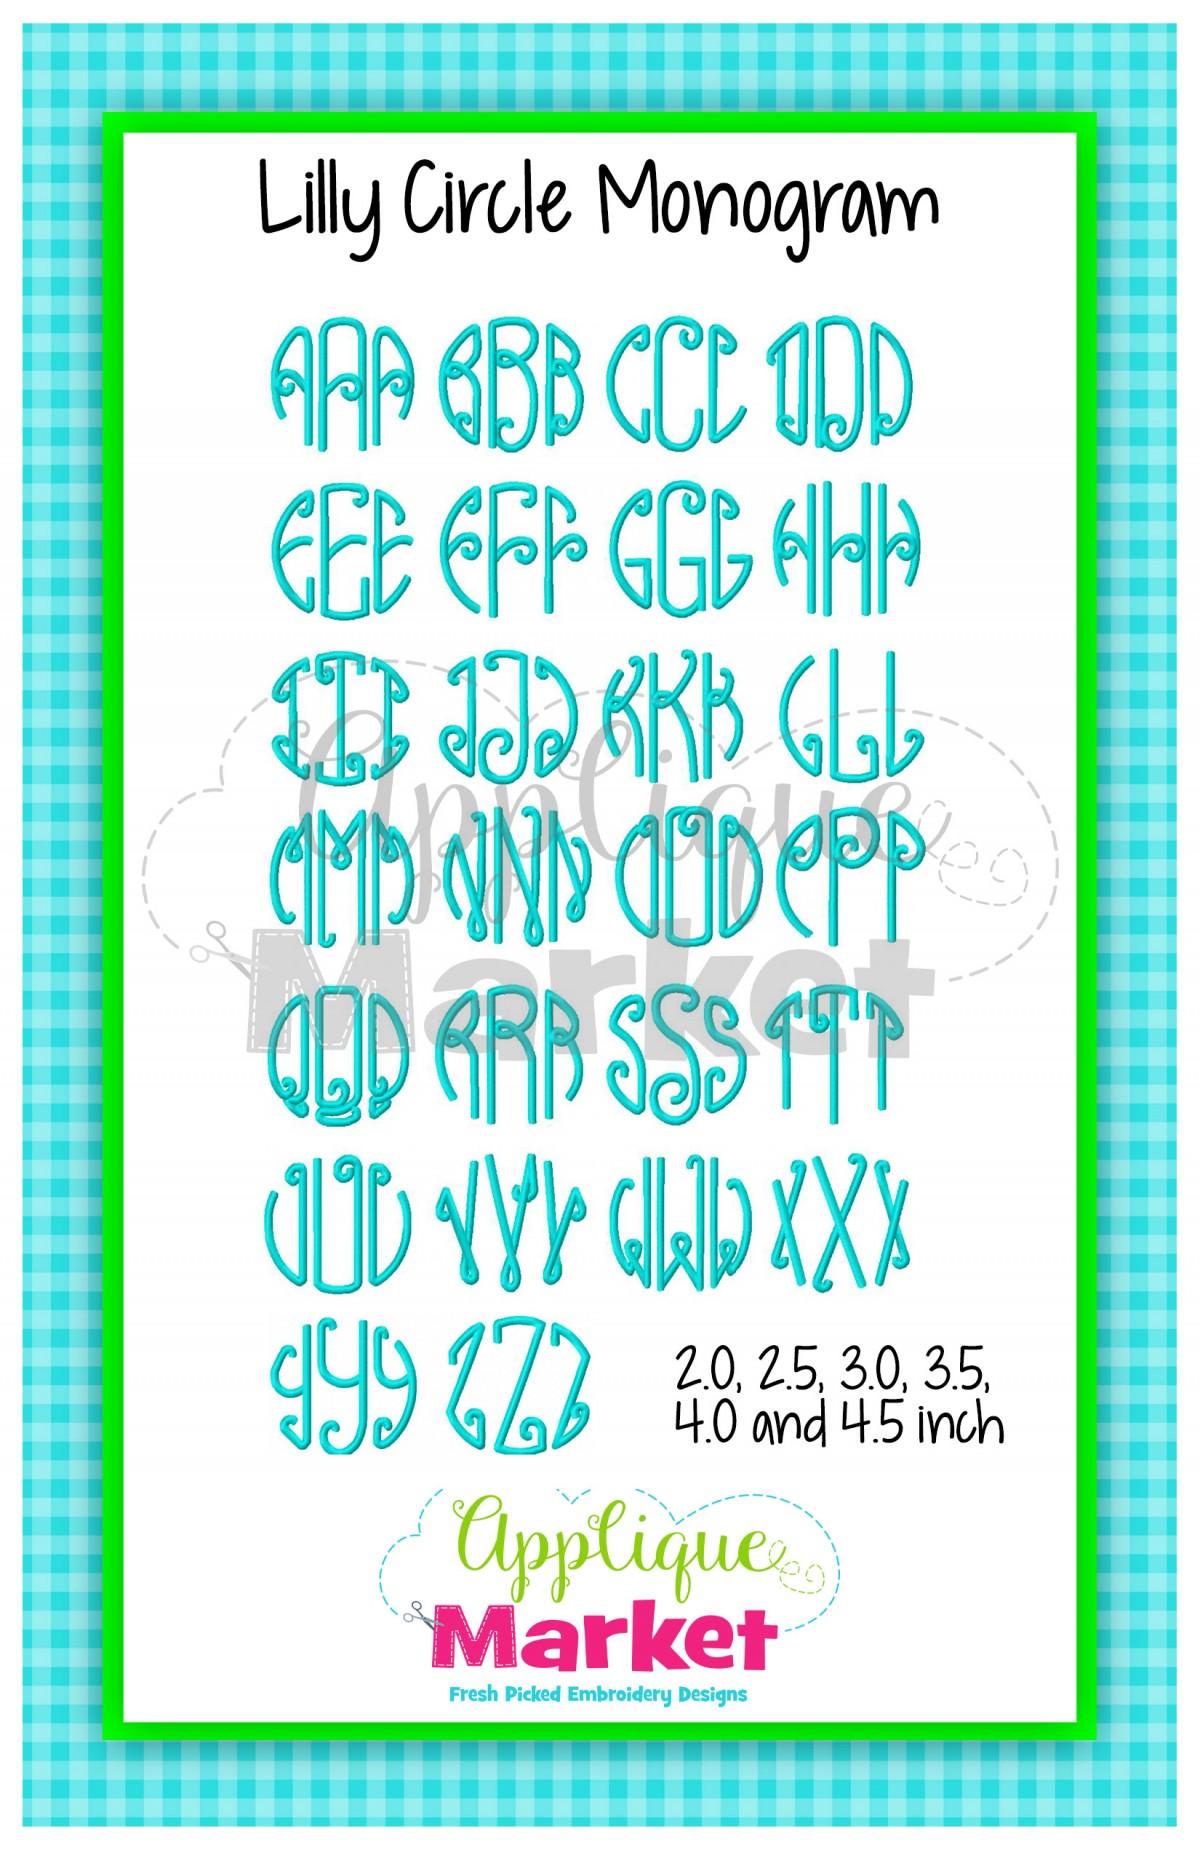 Lilly Circle Monogram Lique Design